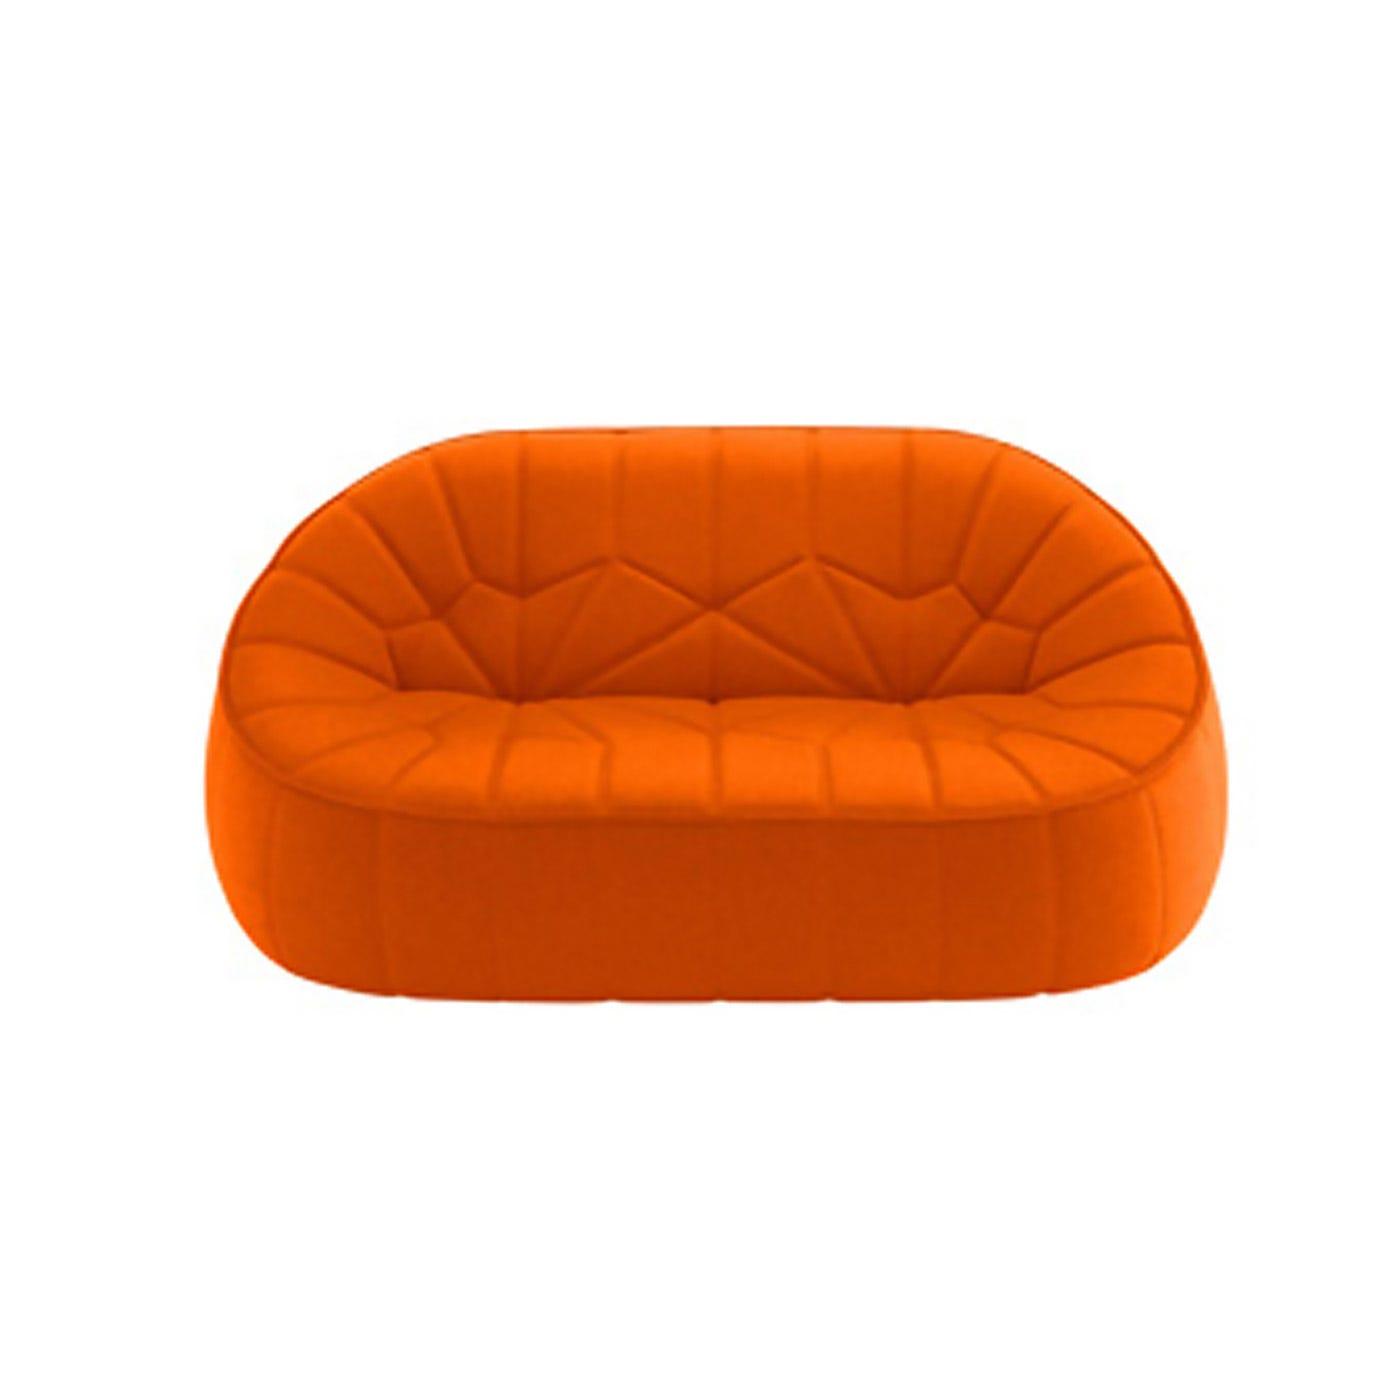 Ottoman 2 Seater Sofa Divinia